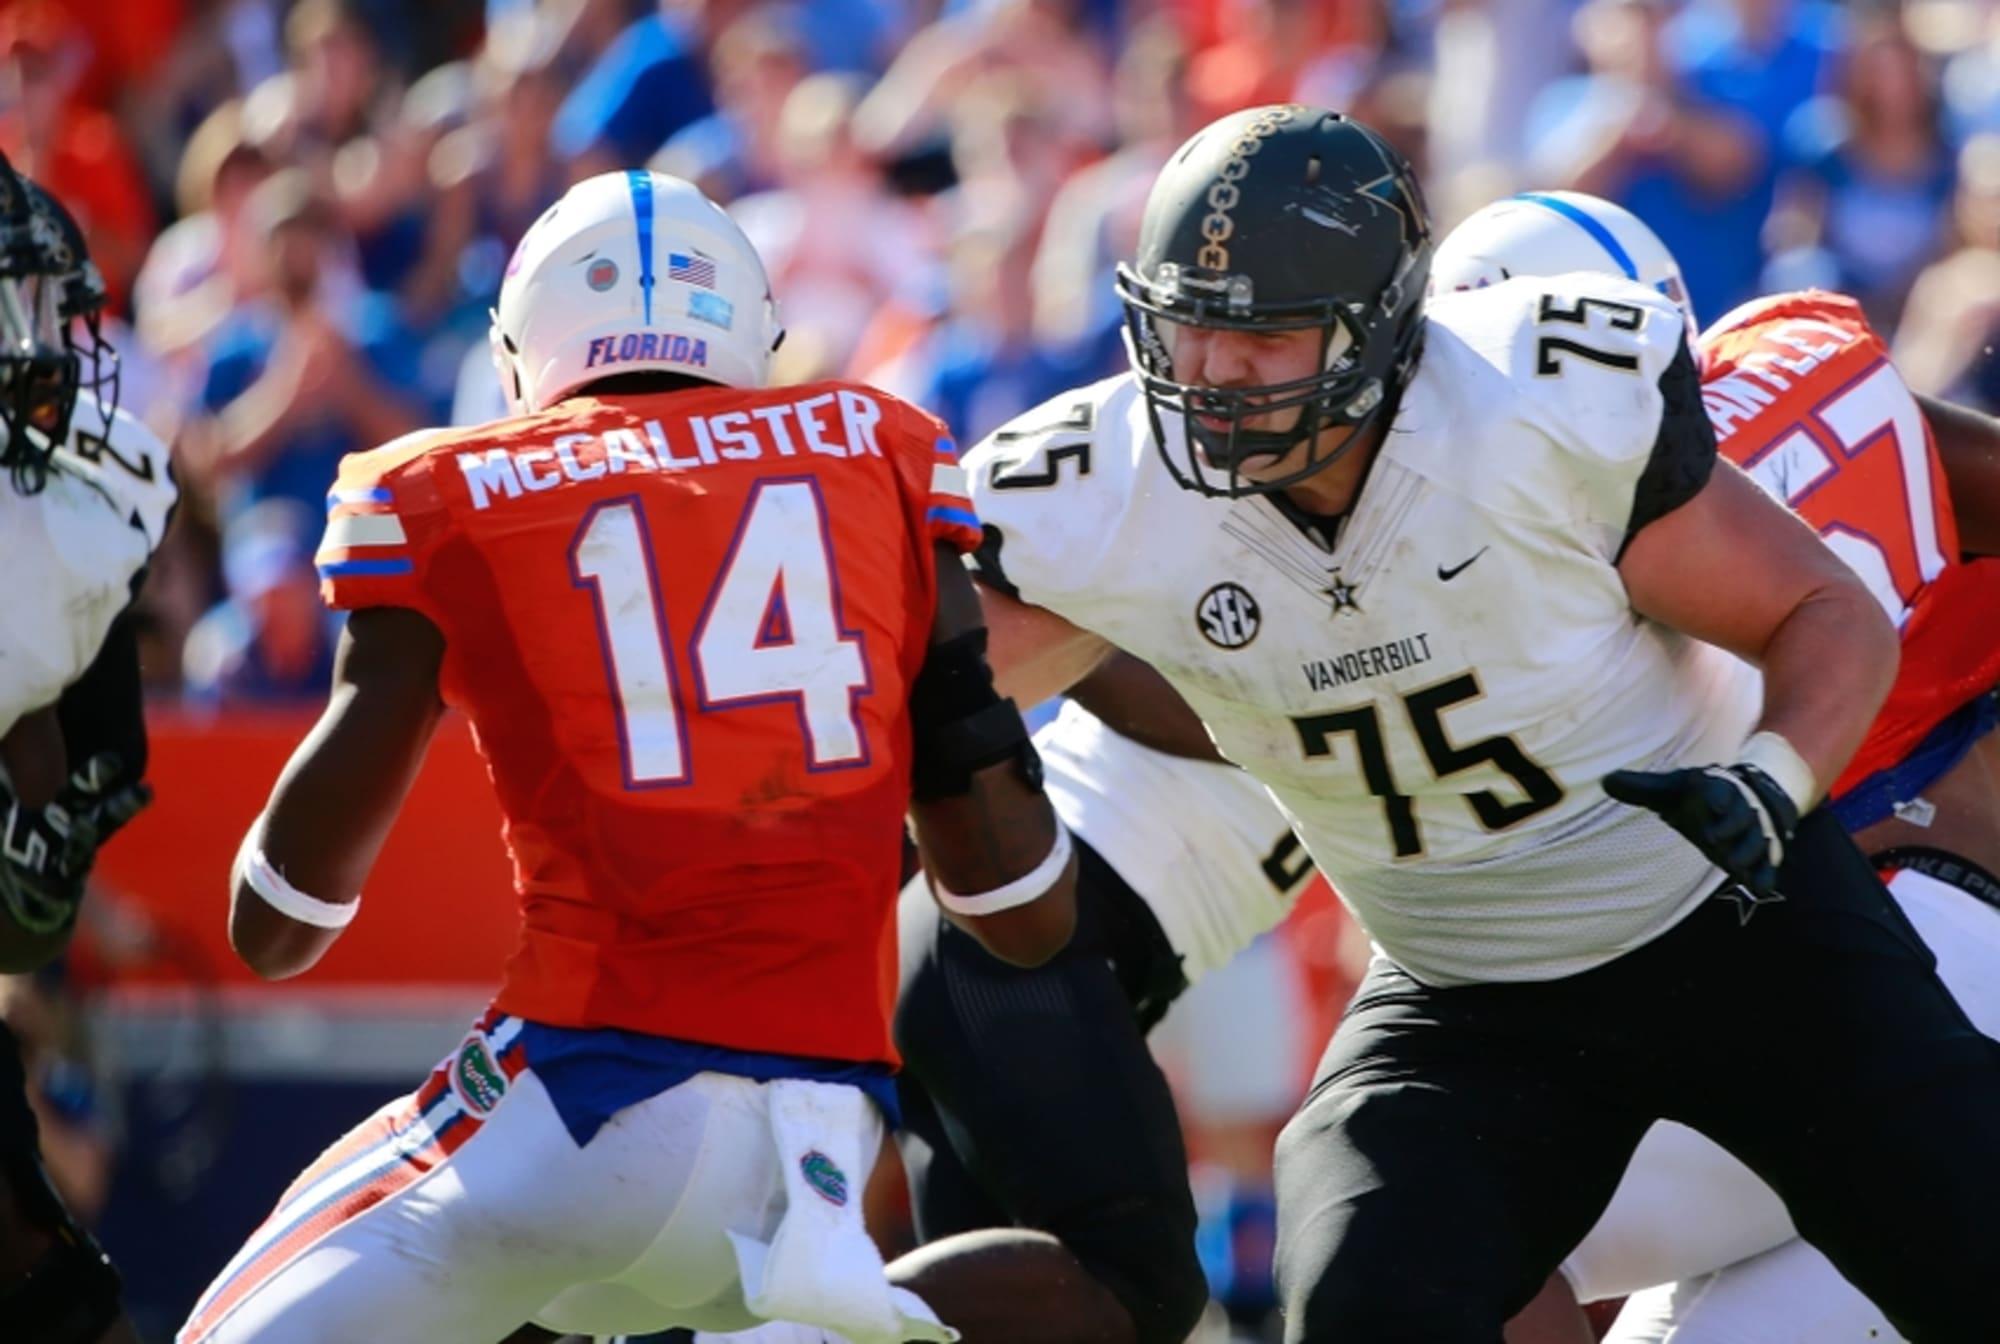 Florida Vs Vanderbilt Live Stream Watch Gators Vs Commodores Online